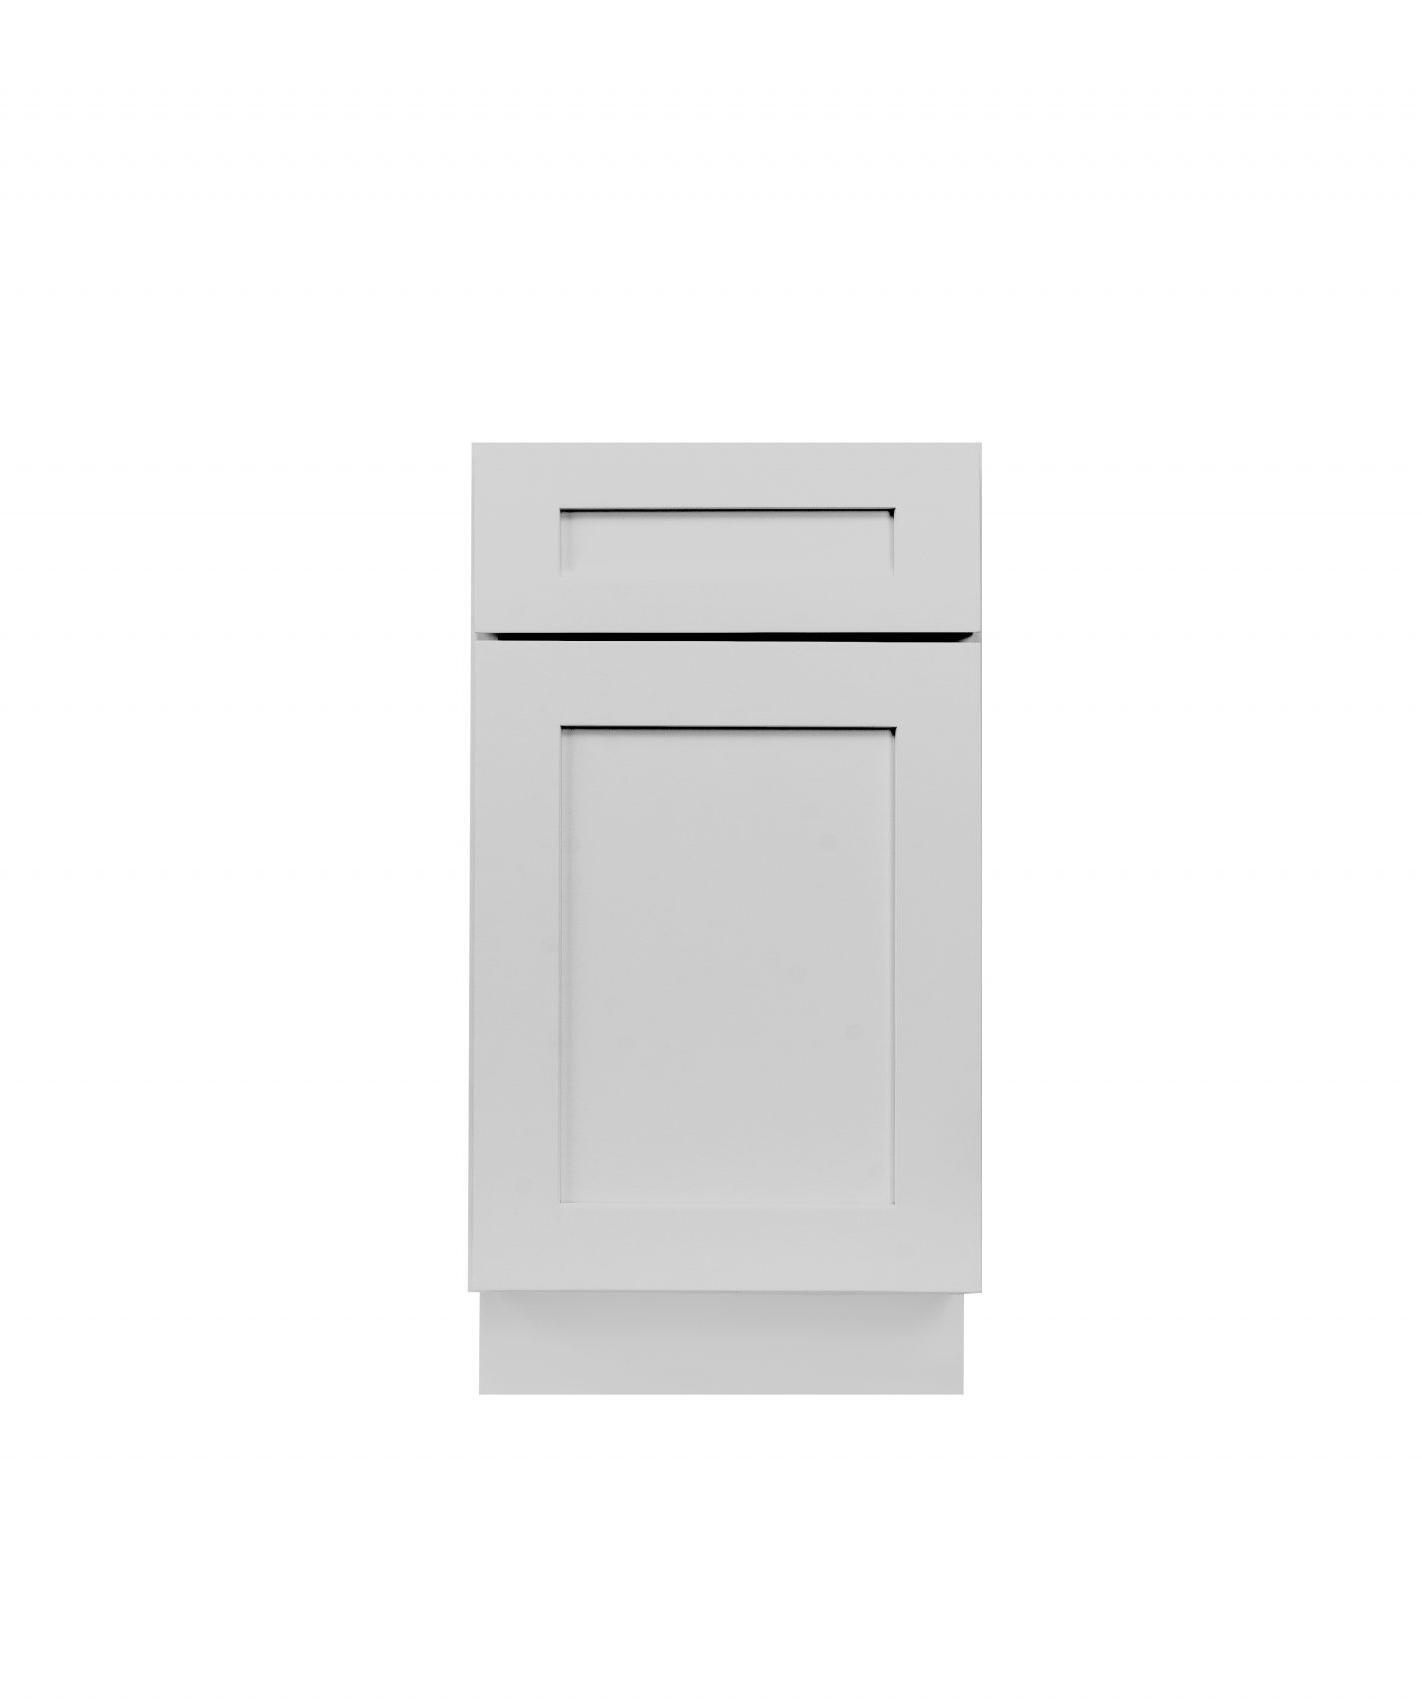 Gray Shaker Cabinetry B12, B15, B18, B21